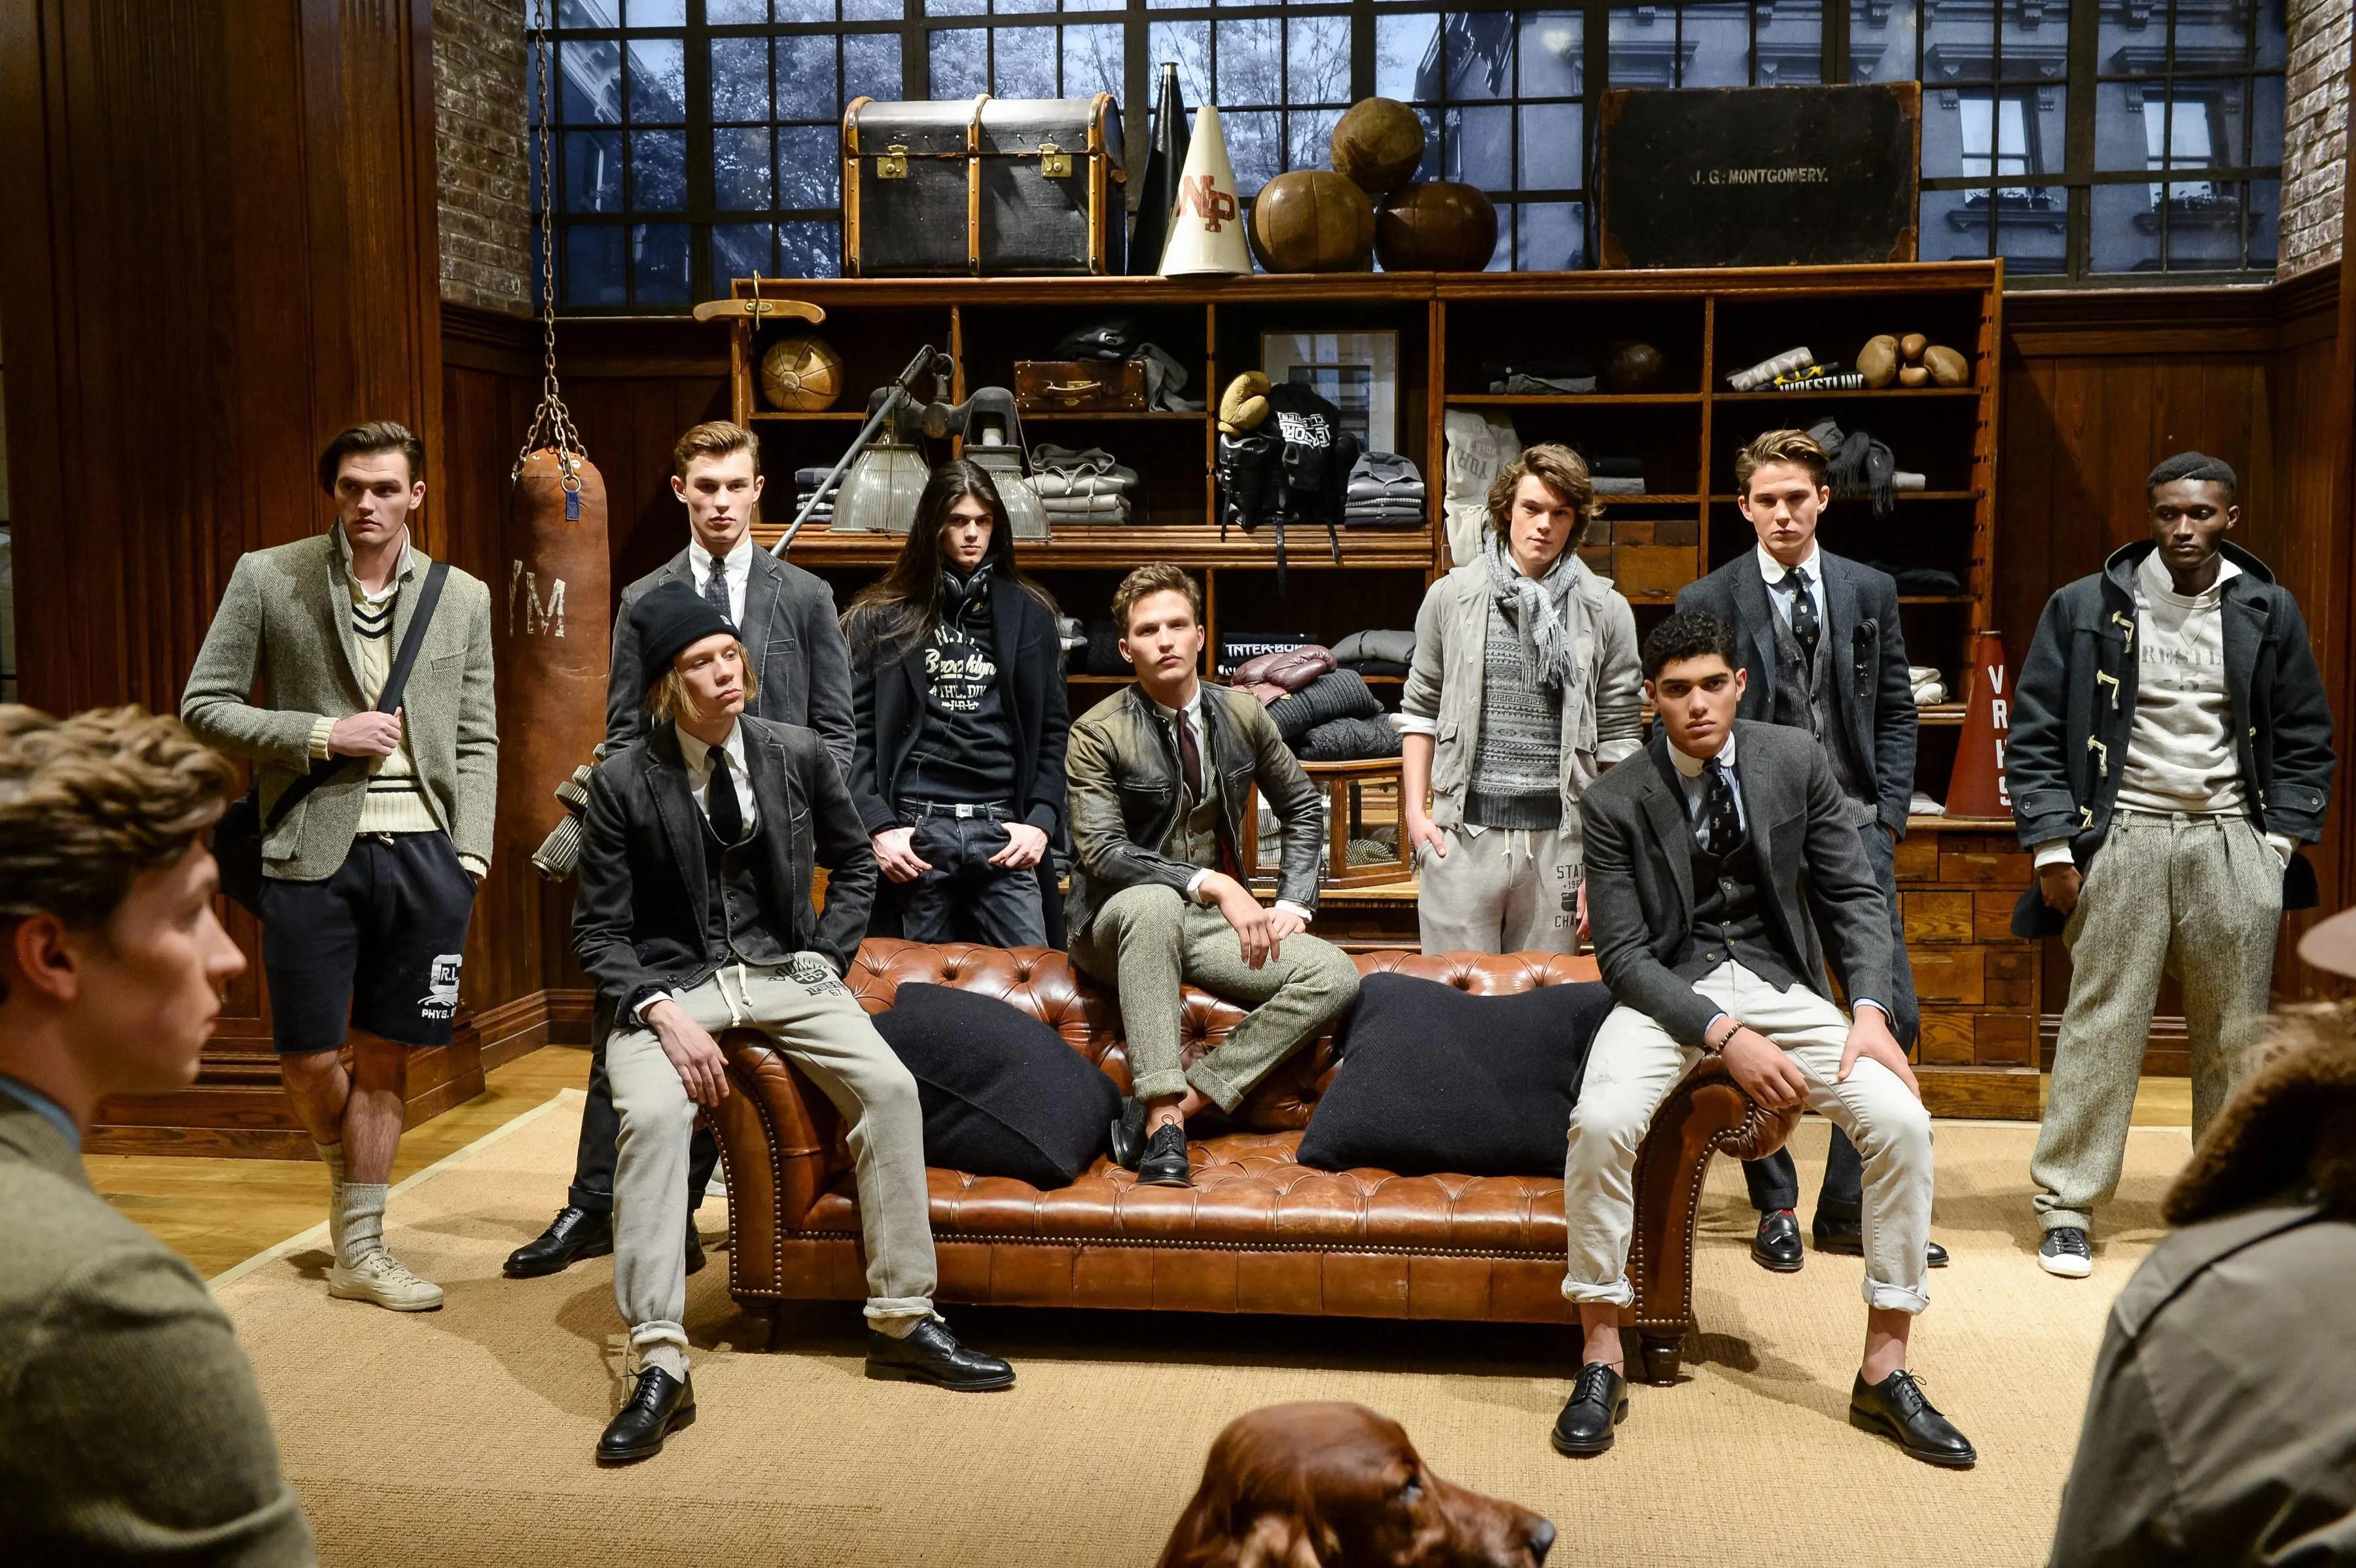 Polo Ralph Lauren AW16 Collection - Ape to Gentleman